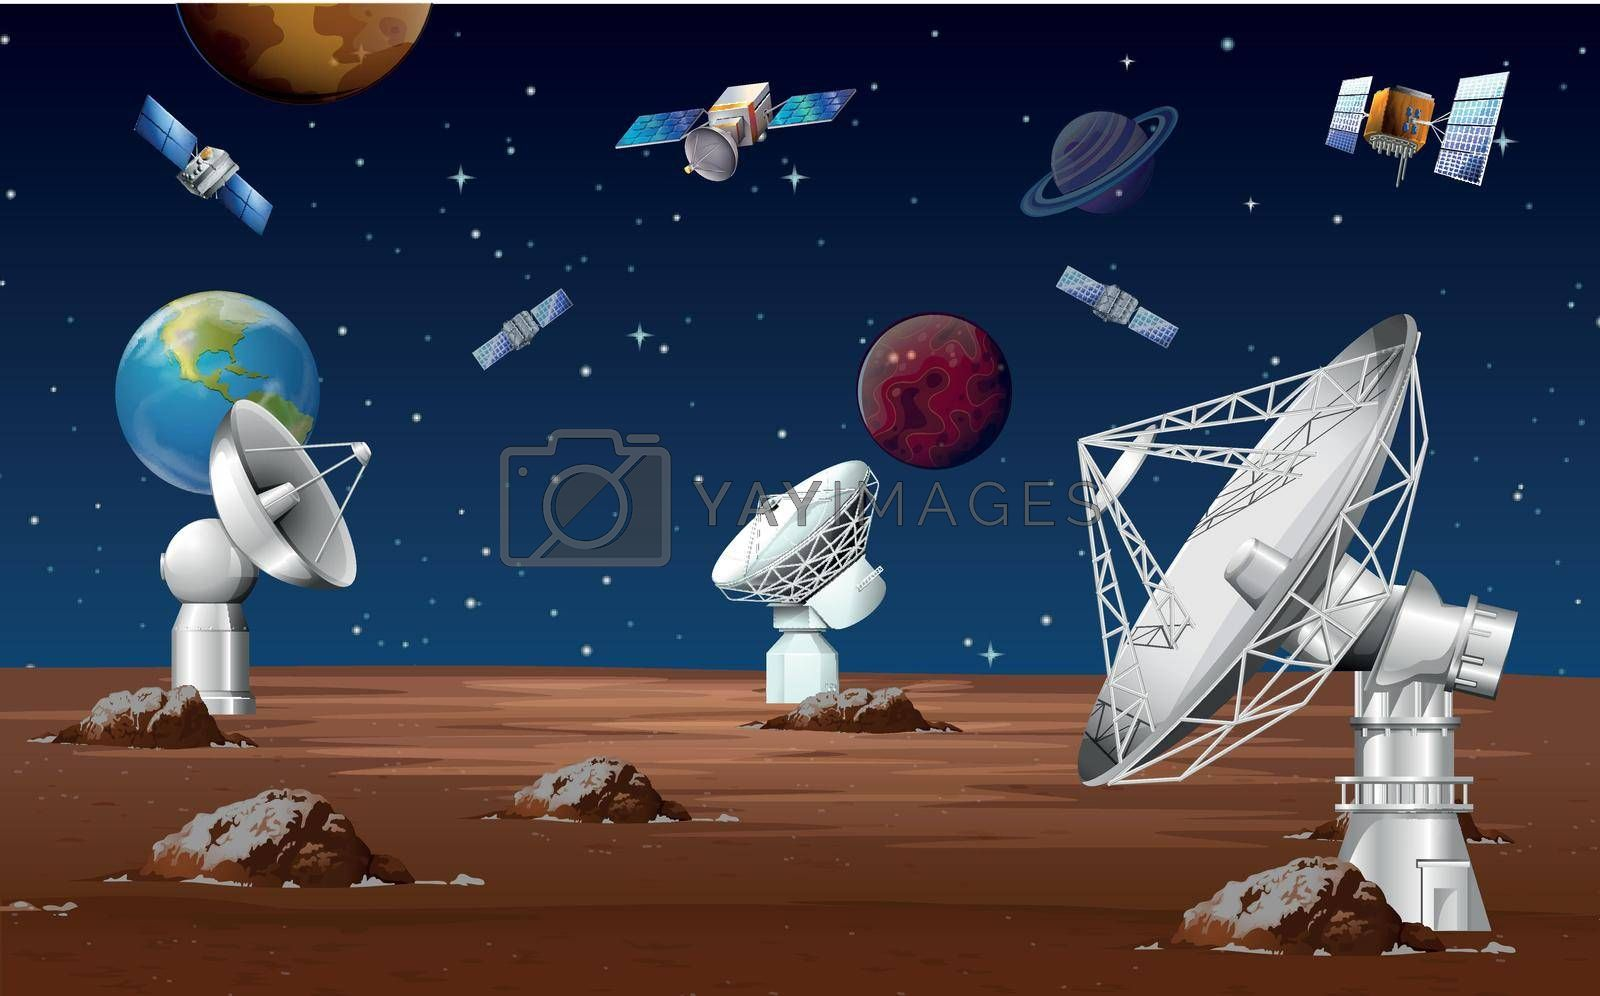 Satellites orbitting around the planet illustration